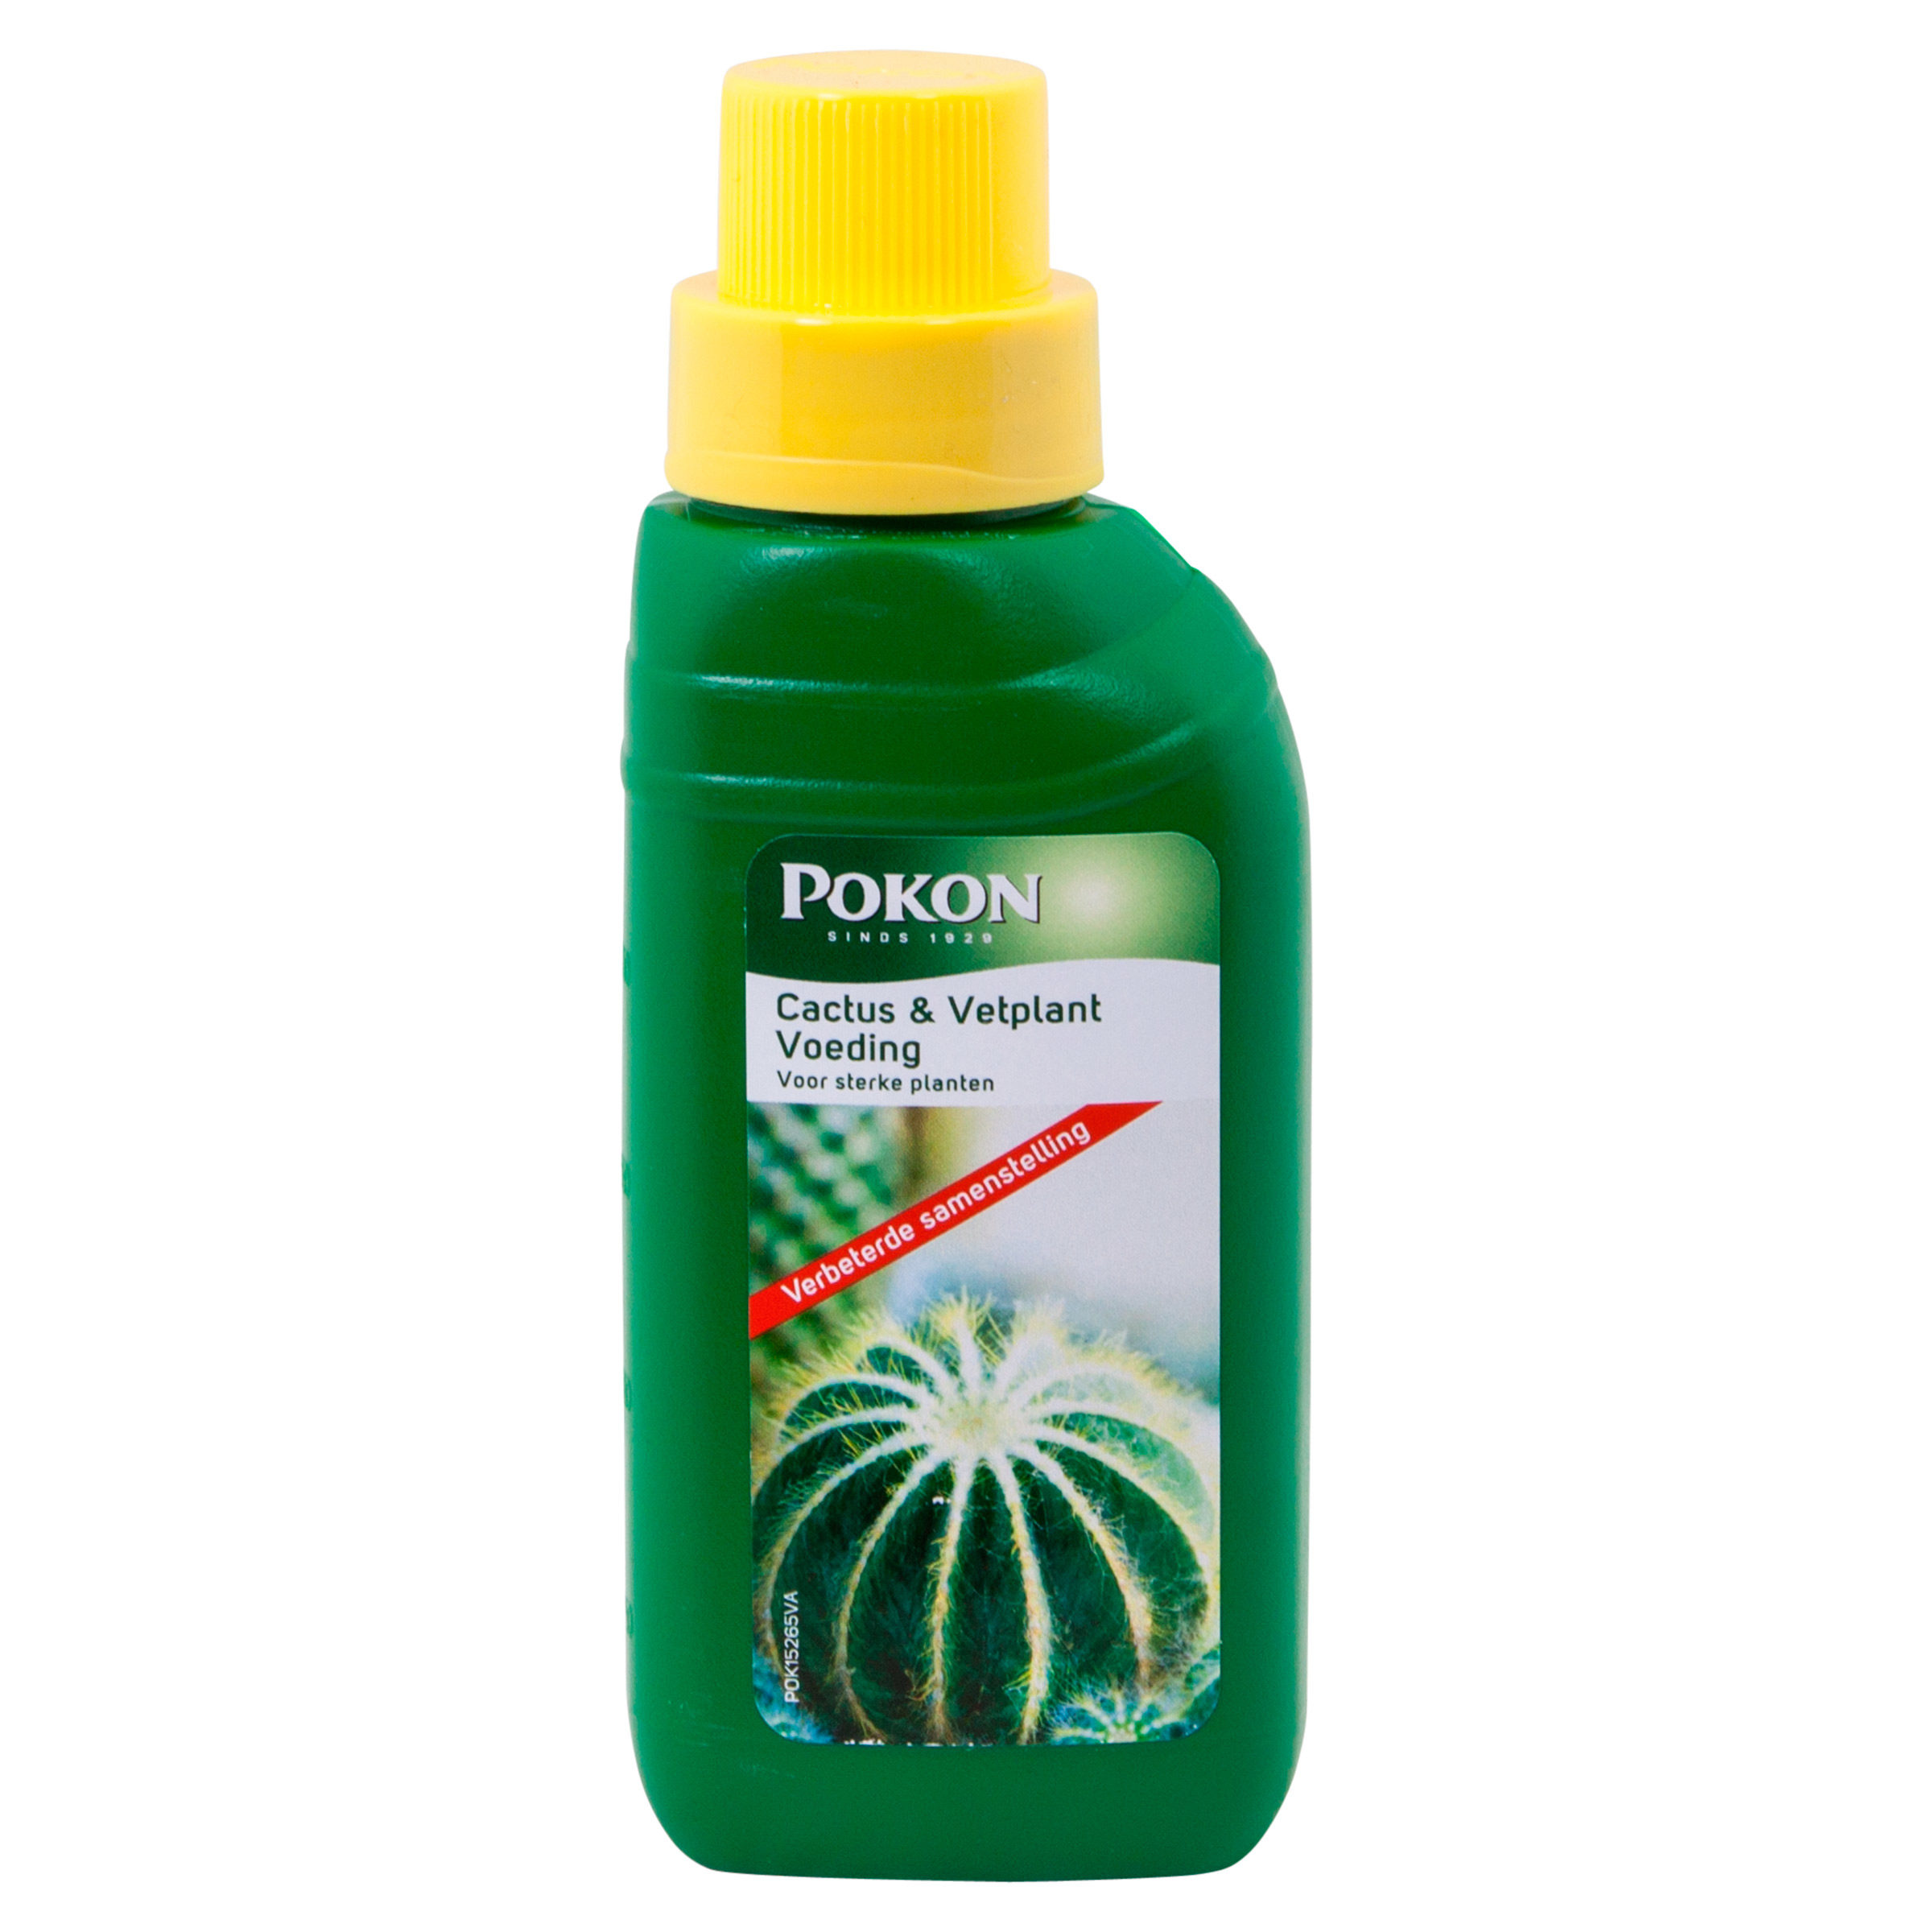 Pokon Cactus & Vetplant Voeding 250ml